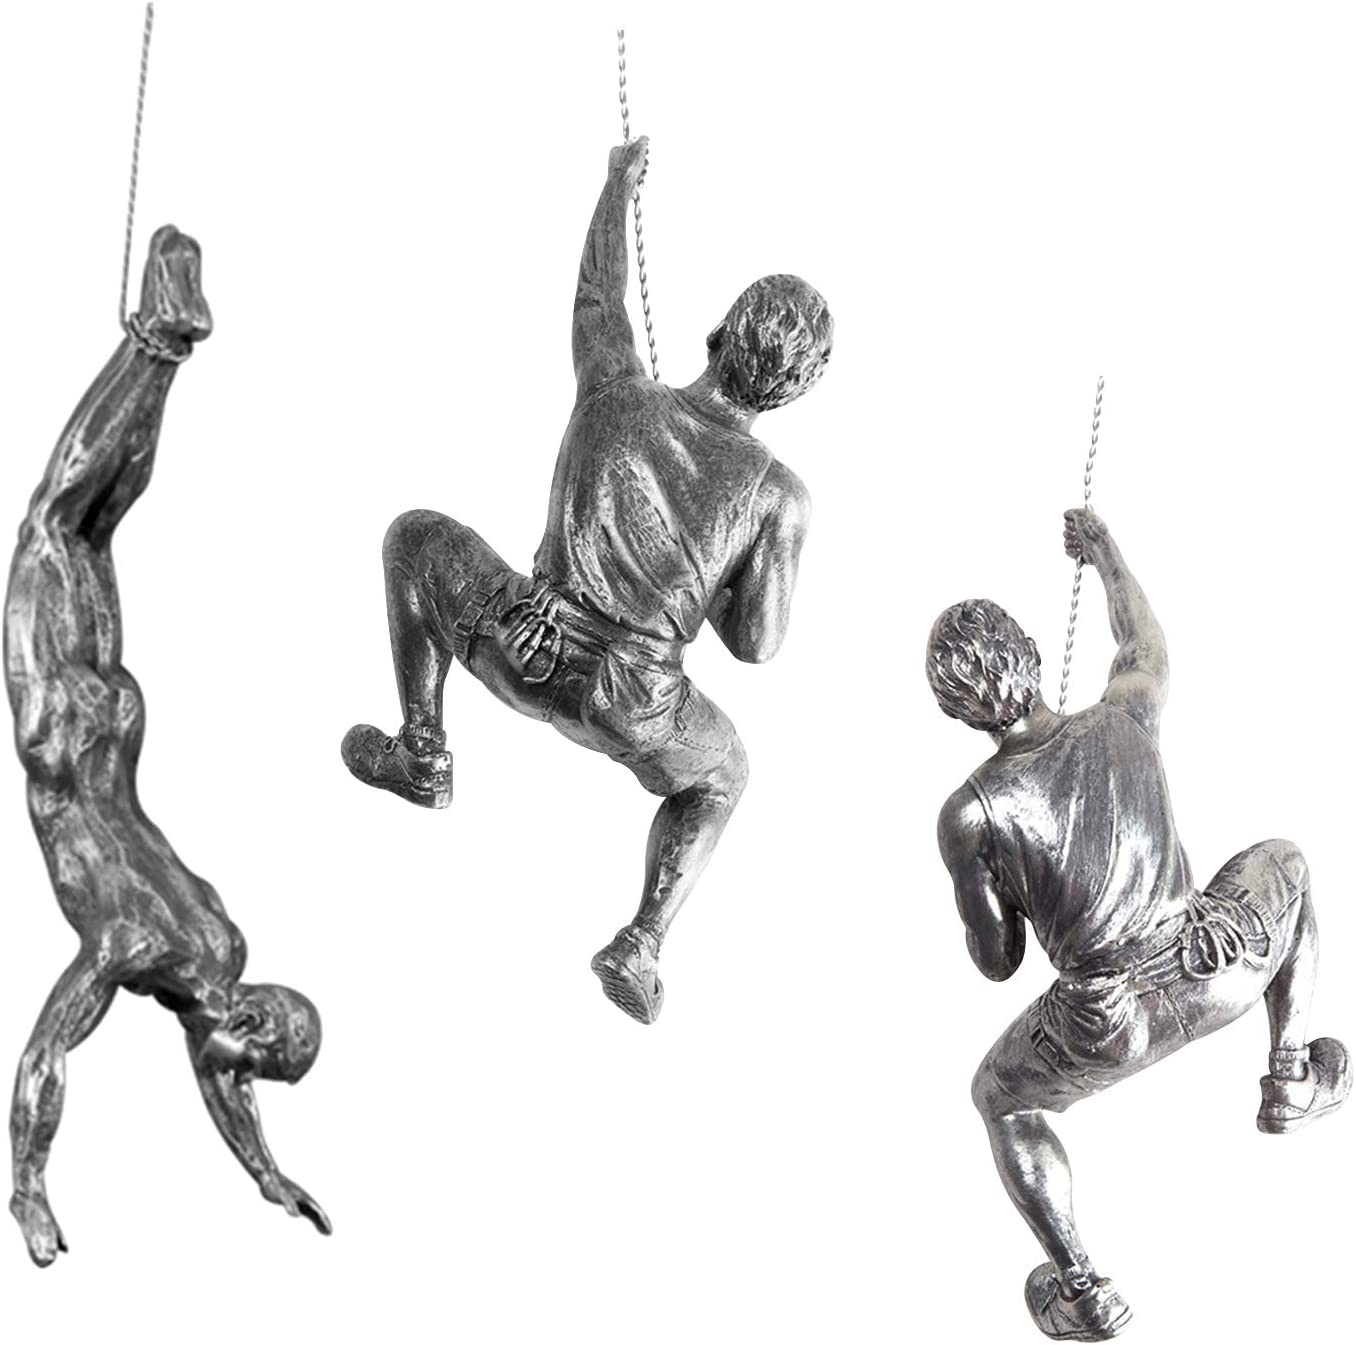 Ibnotuiy Men Climbing Wall Sculpture 3Pcs/Set Resin Art Wall Sculptures Home Decor Small Vintage Statue Figure Kit for Living Room/Bedroom/Office/Garden (Silver Rust)